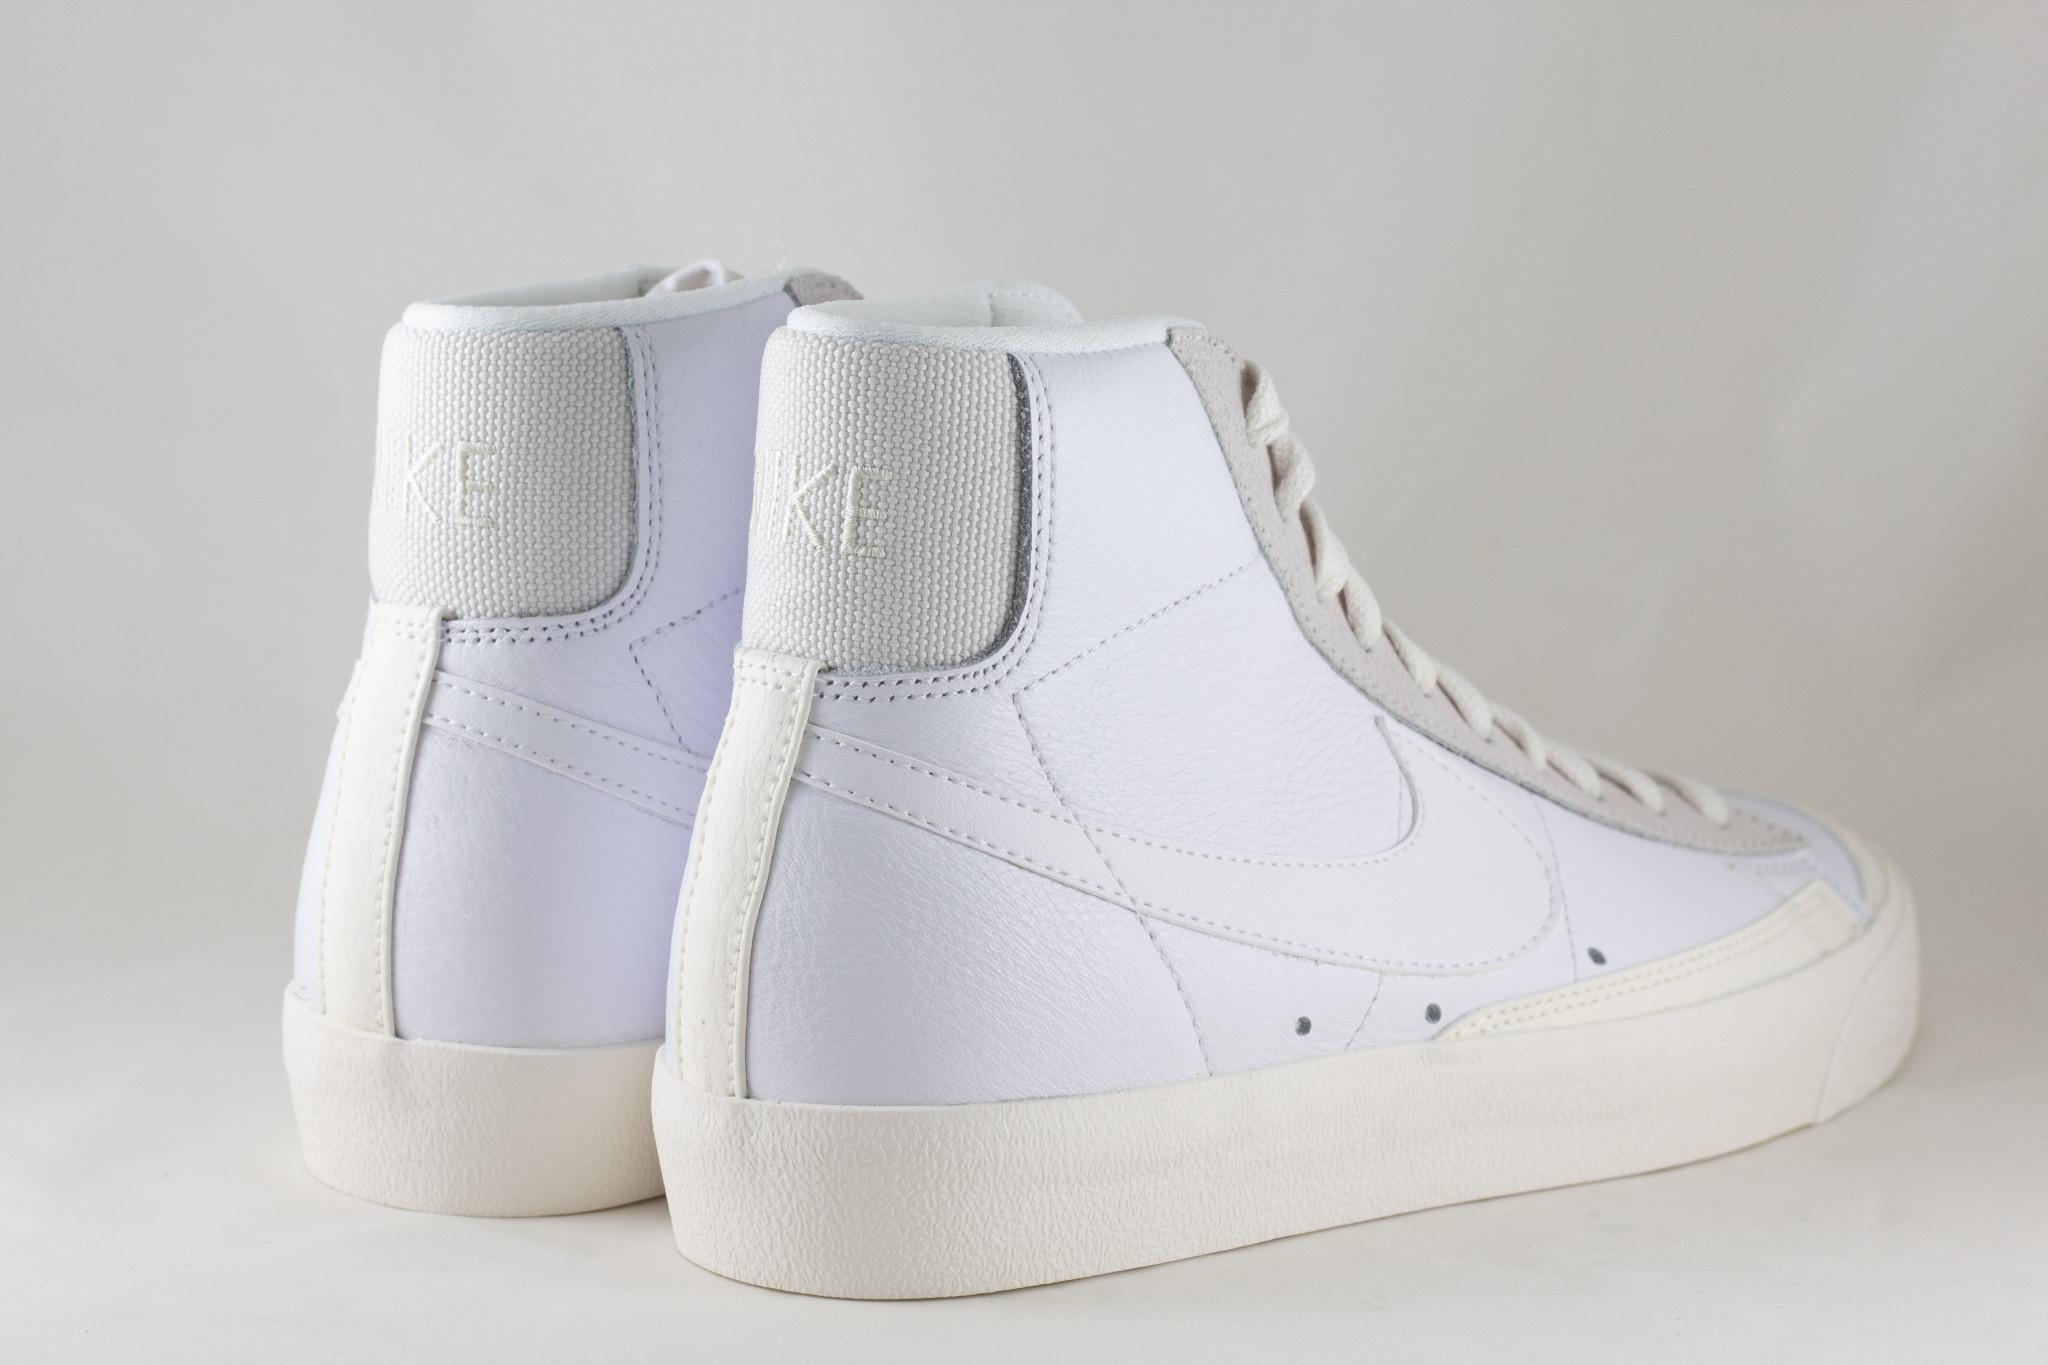 NIKE BLAZER MID '77 White/ White- Sail- Platinum Tint